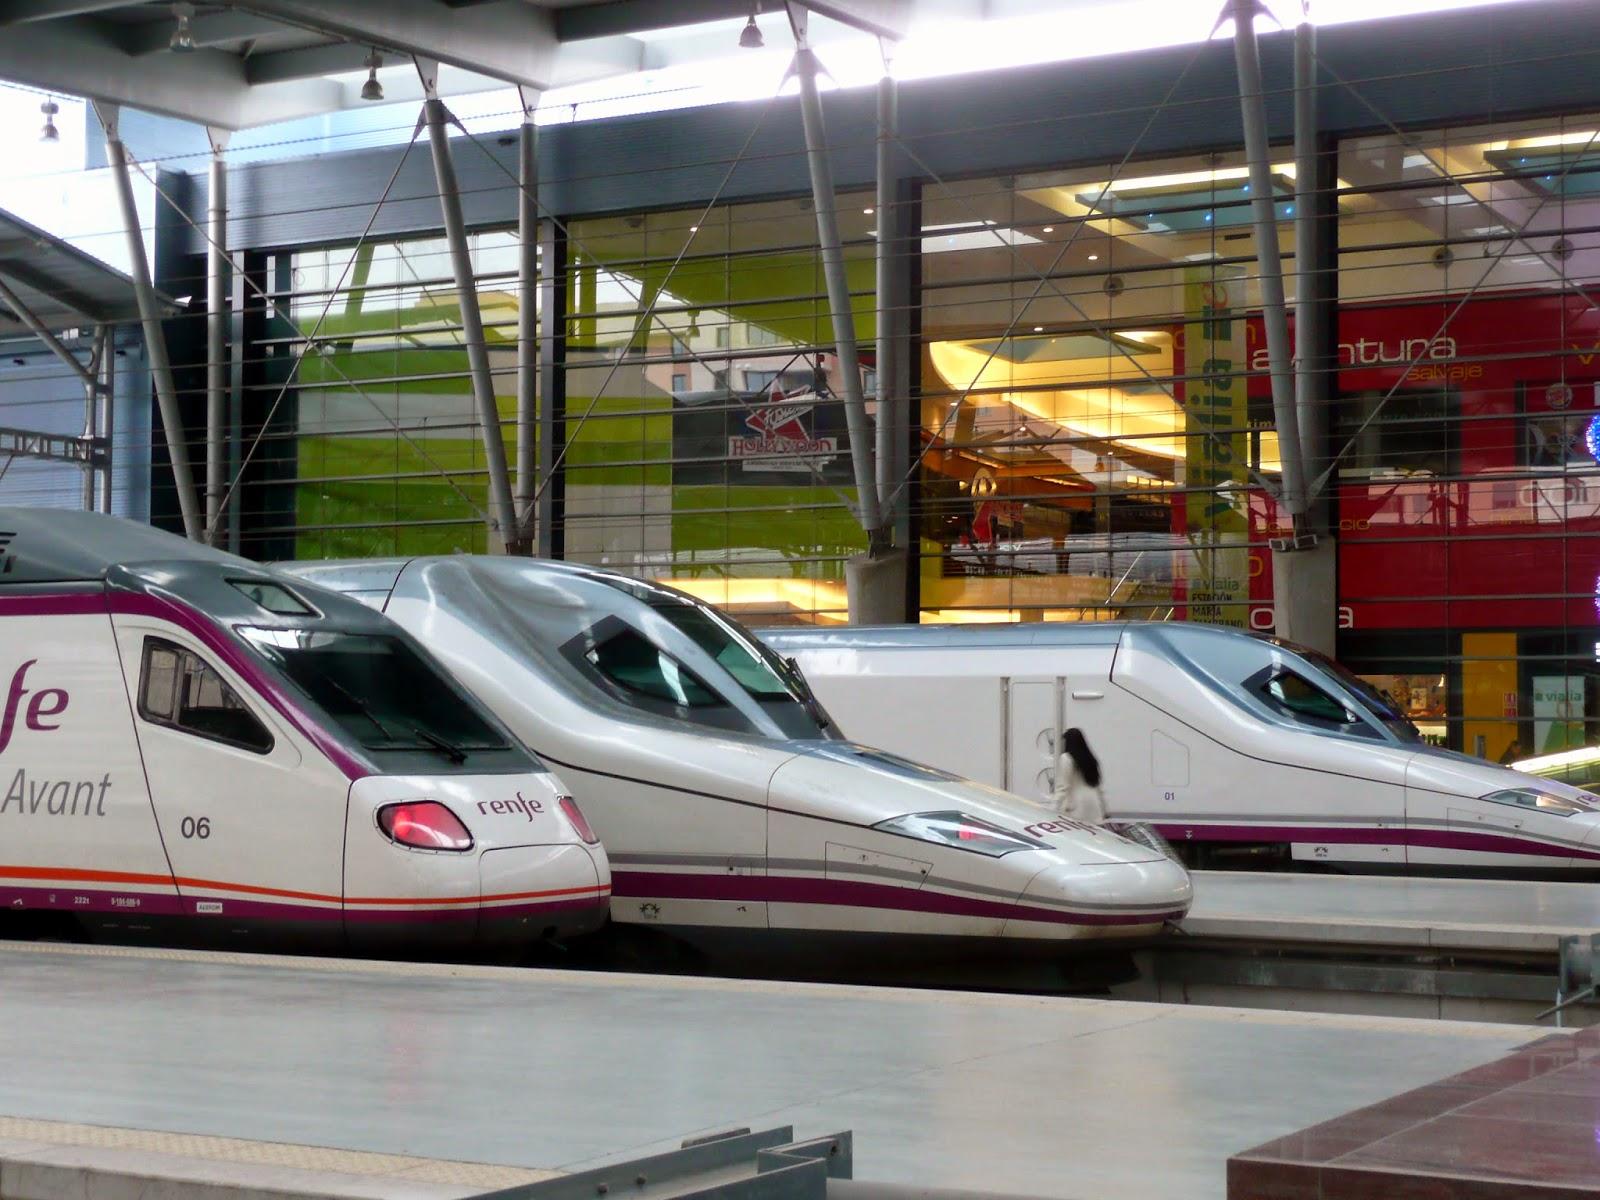 Emeota Cheap Airport Parking Malaga Train Station And Port